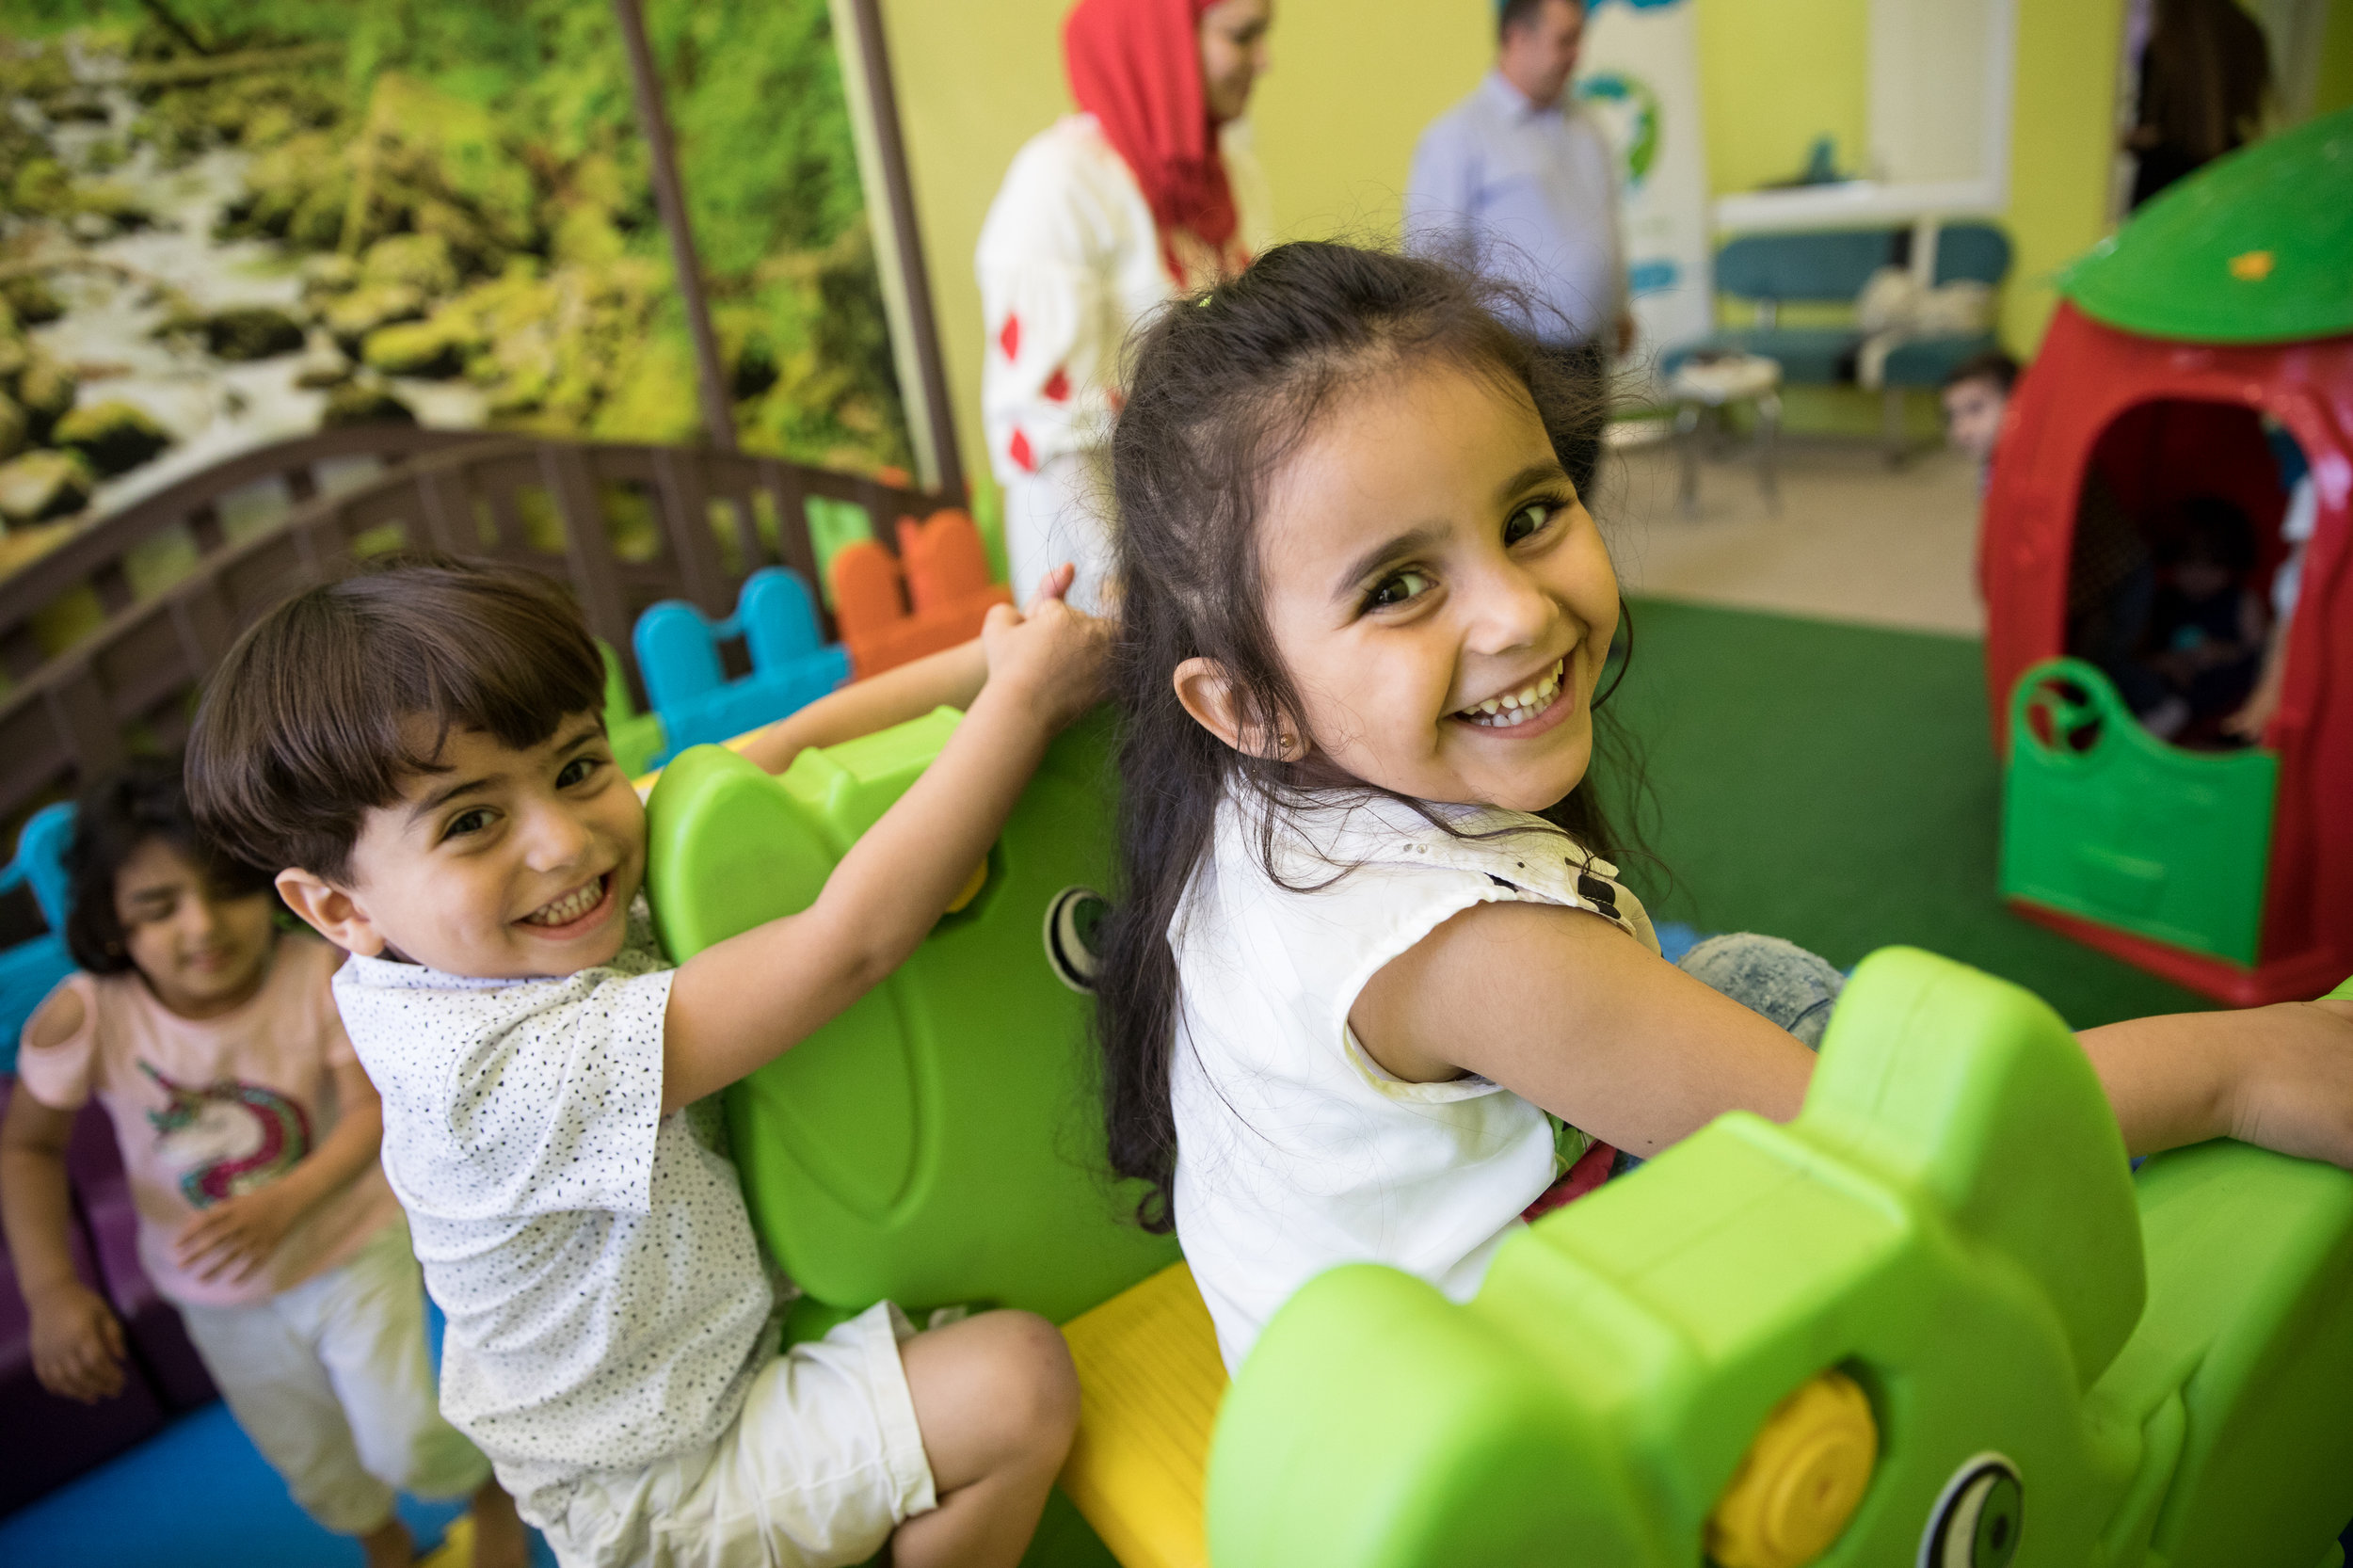 2018-07-03_Dania Al Bouchi, 30, Dunya Al Khayal Kindergarten, Gaziantep, TK_0076.jpg